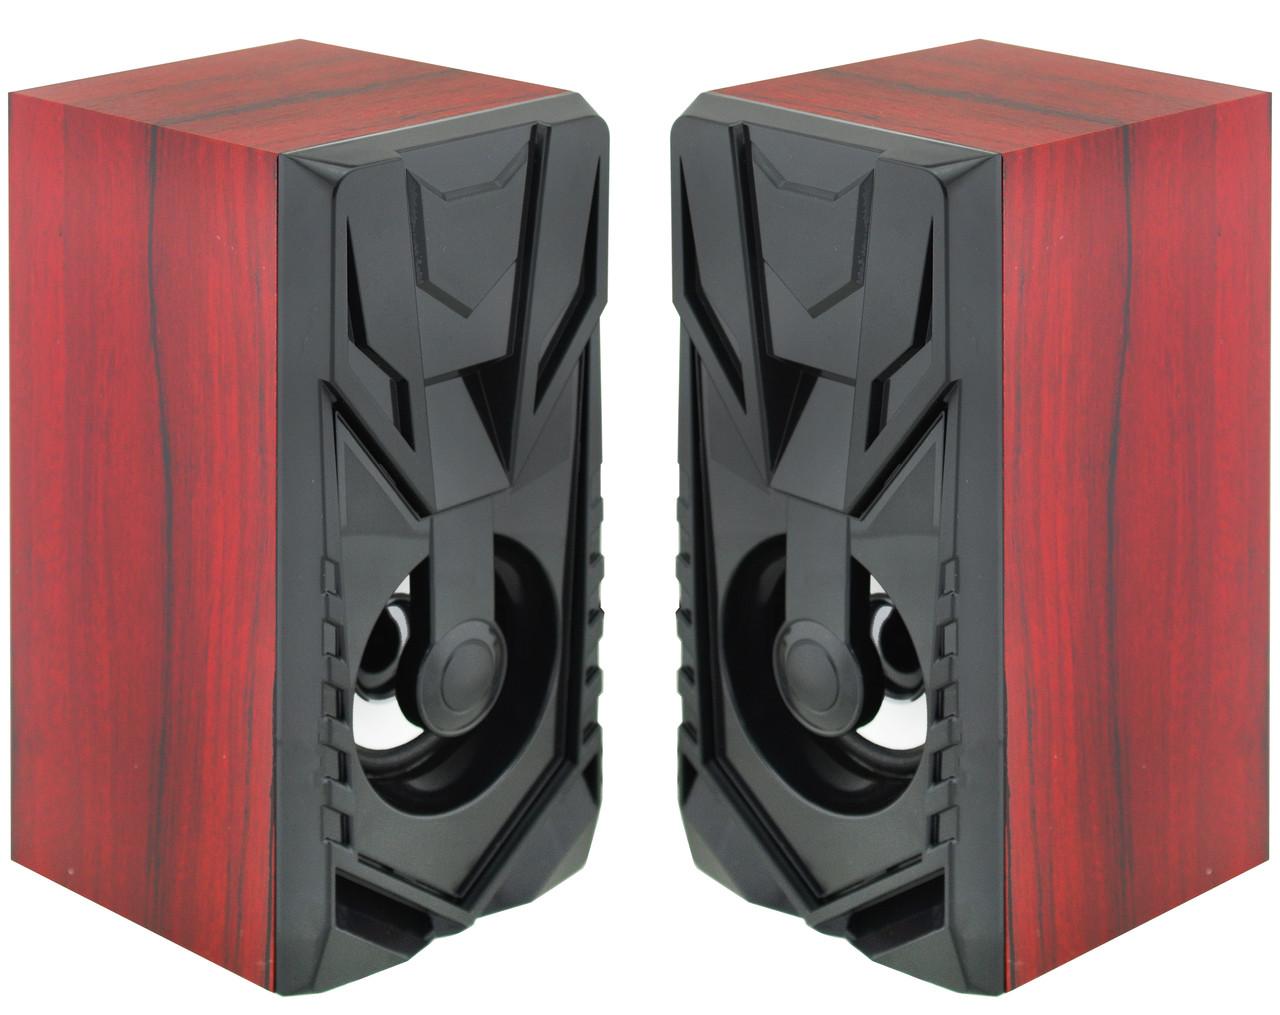 Колонки для ПК комп'ютера Prime FT-858AC 220V Red Wooden (7627)